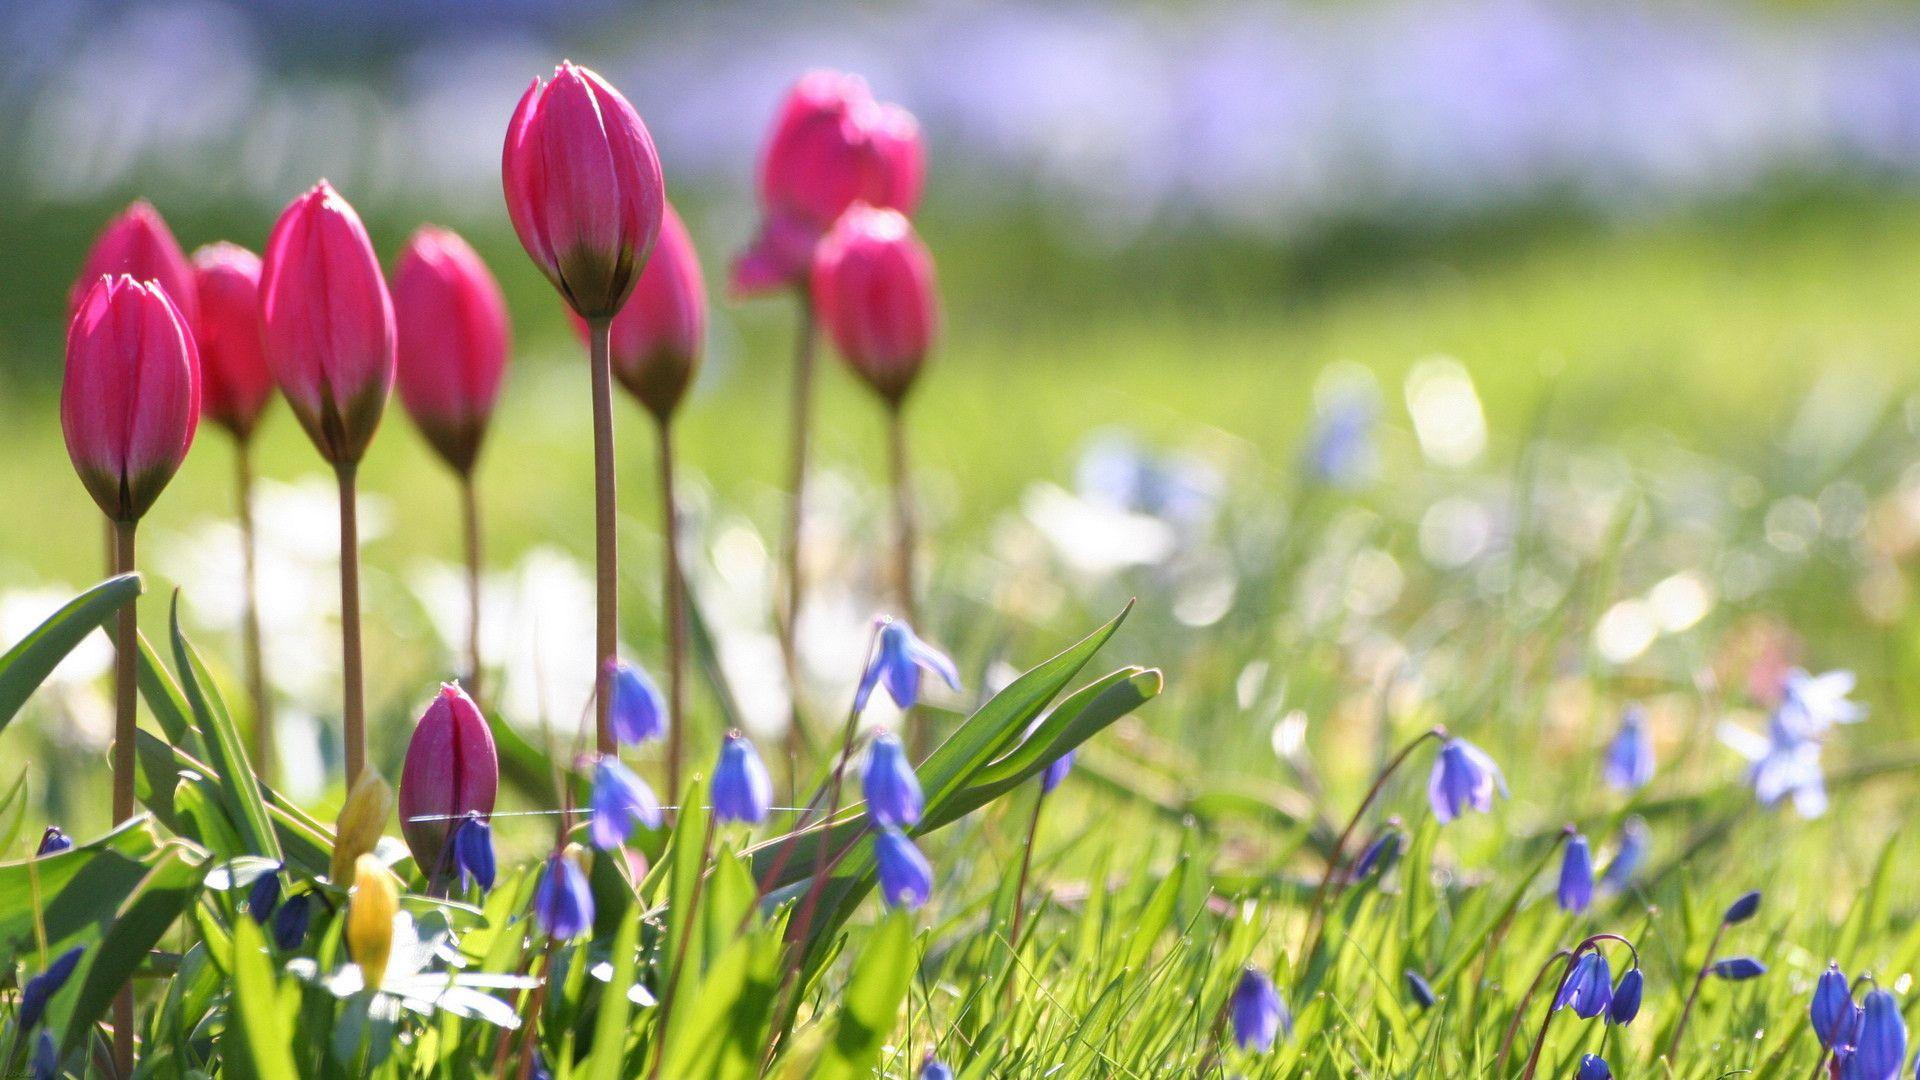 Ljubicice I Tulipani Spring Flowers Wallpaper Wallpaper Nature Flowers Spring Flowers Images